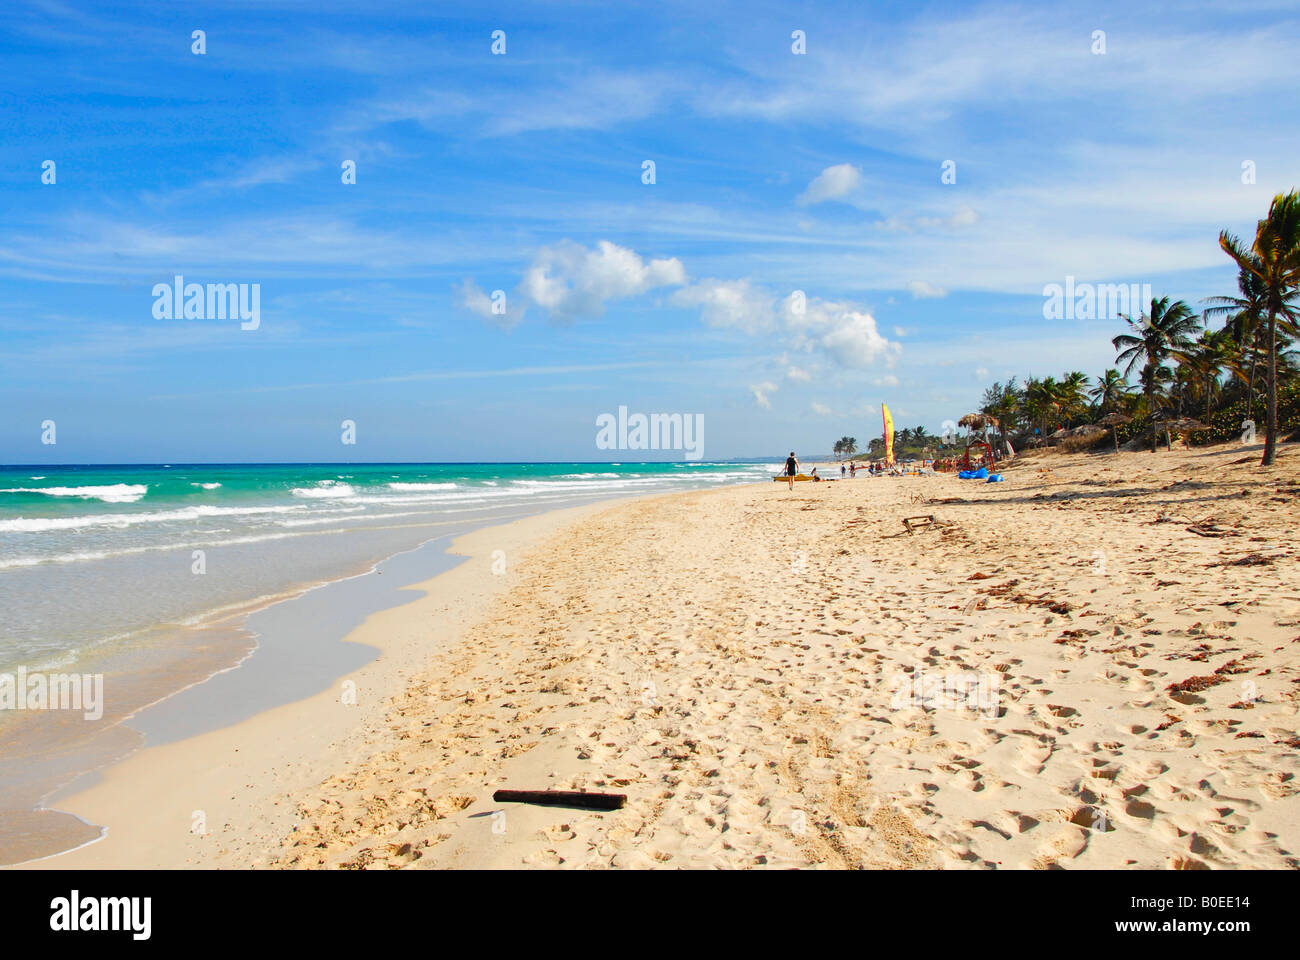 Der Strand von Playa del Este, Havanna, Kuba Stockbild